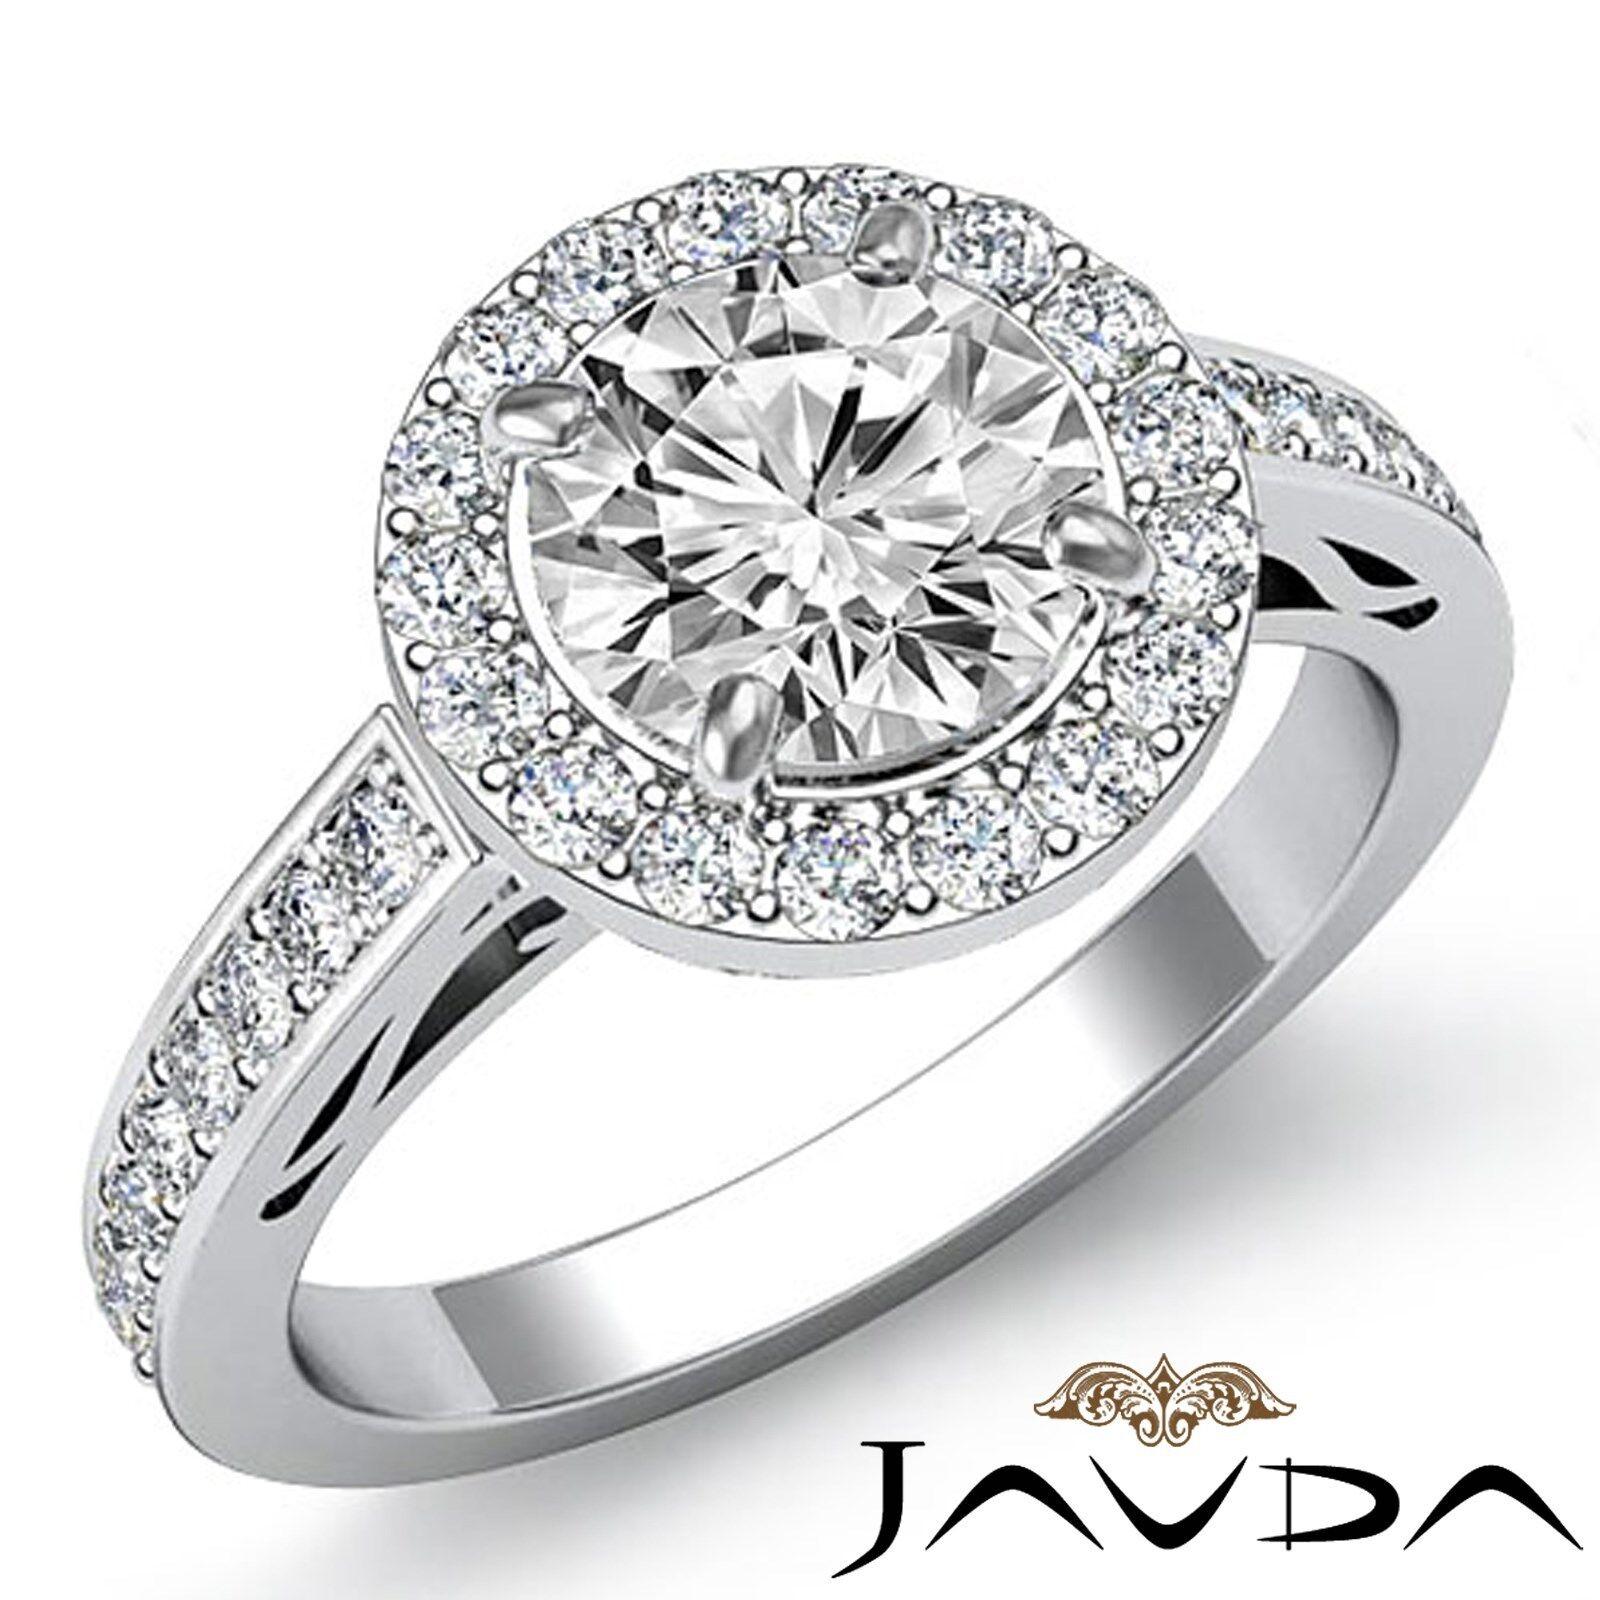 Filigree Design Halo Round Diamond Engagement Micro Pave Ring GIA F VS1 2.3 Ct